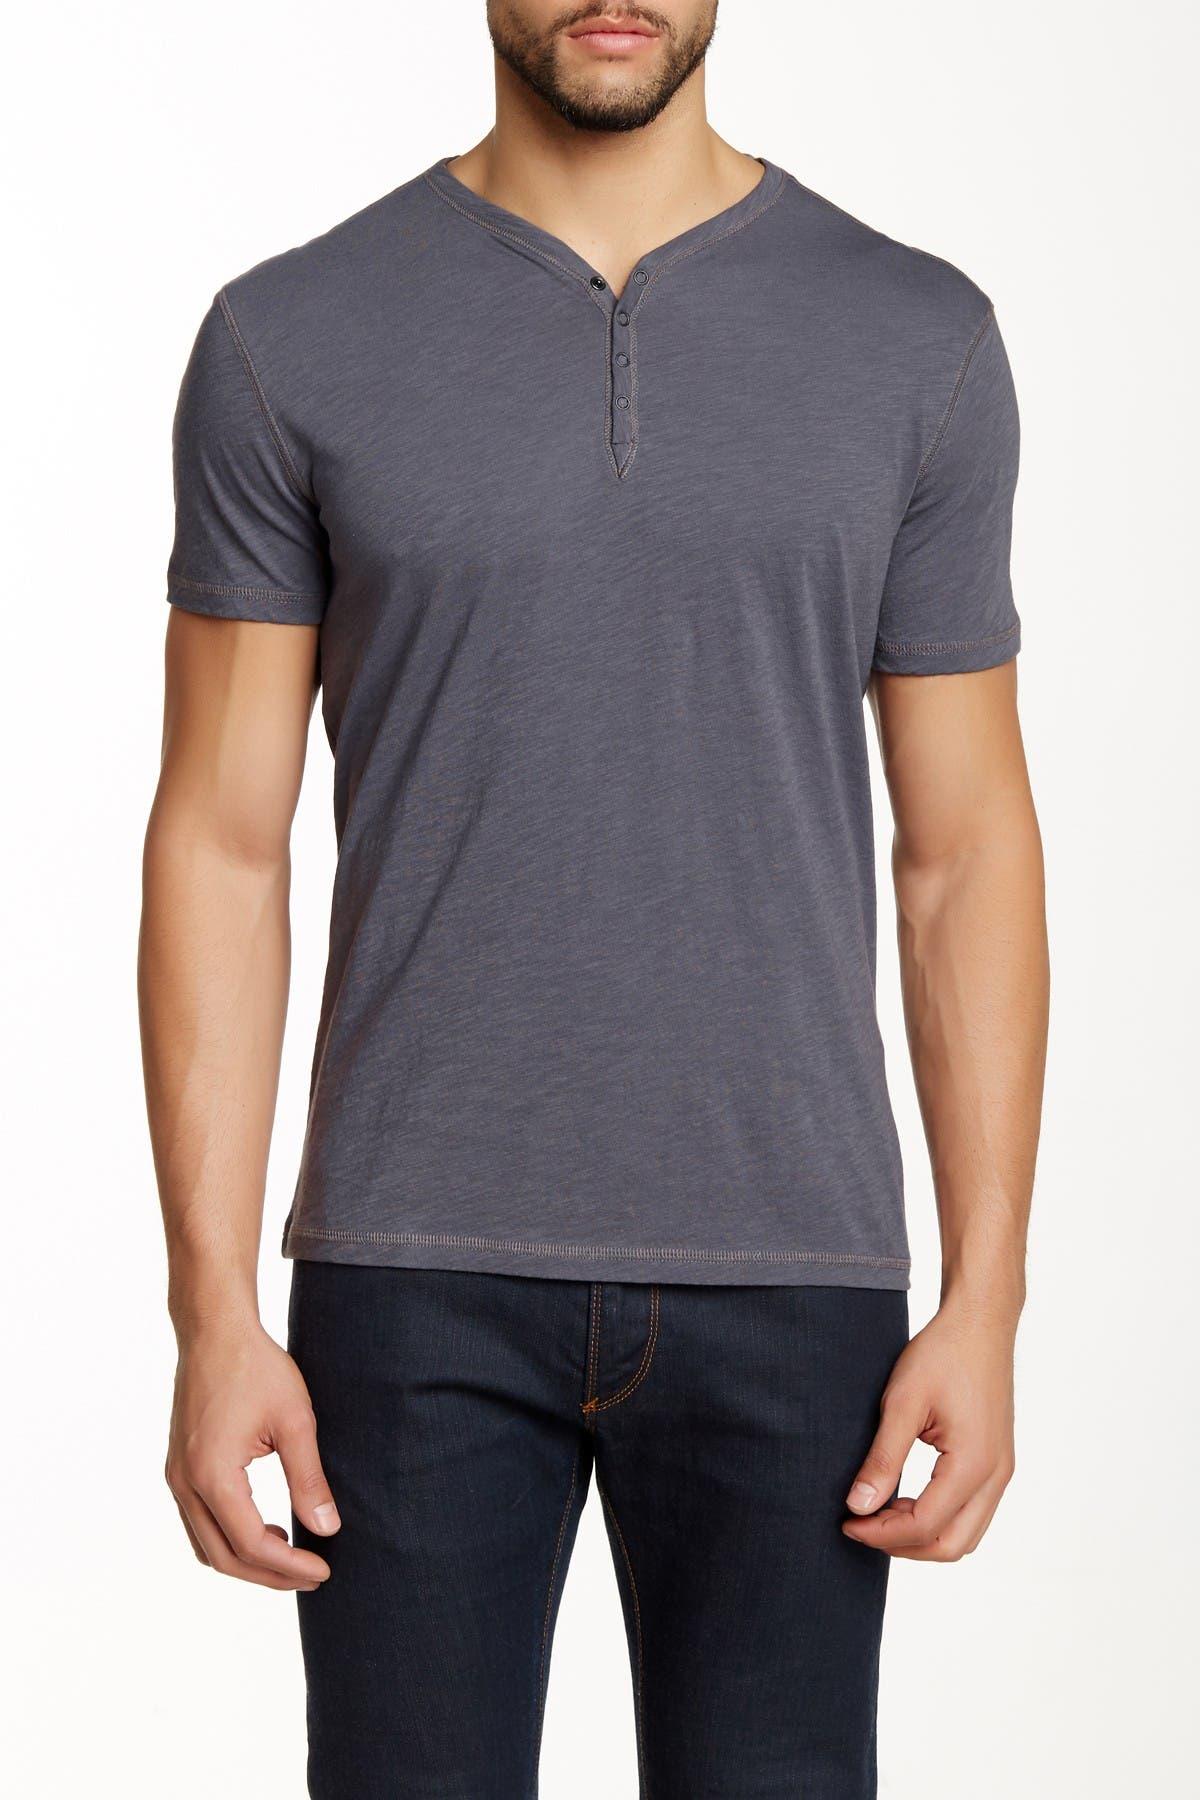 John Varvatos Star USA Men/'s Short Sleeve Crew Snap Henley Shirt Multi Colors